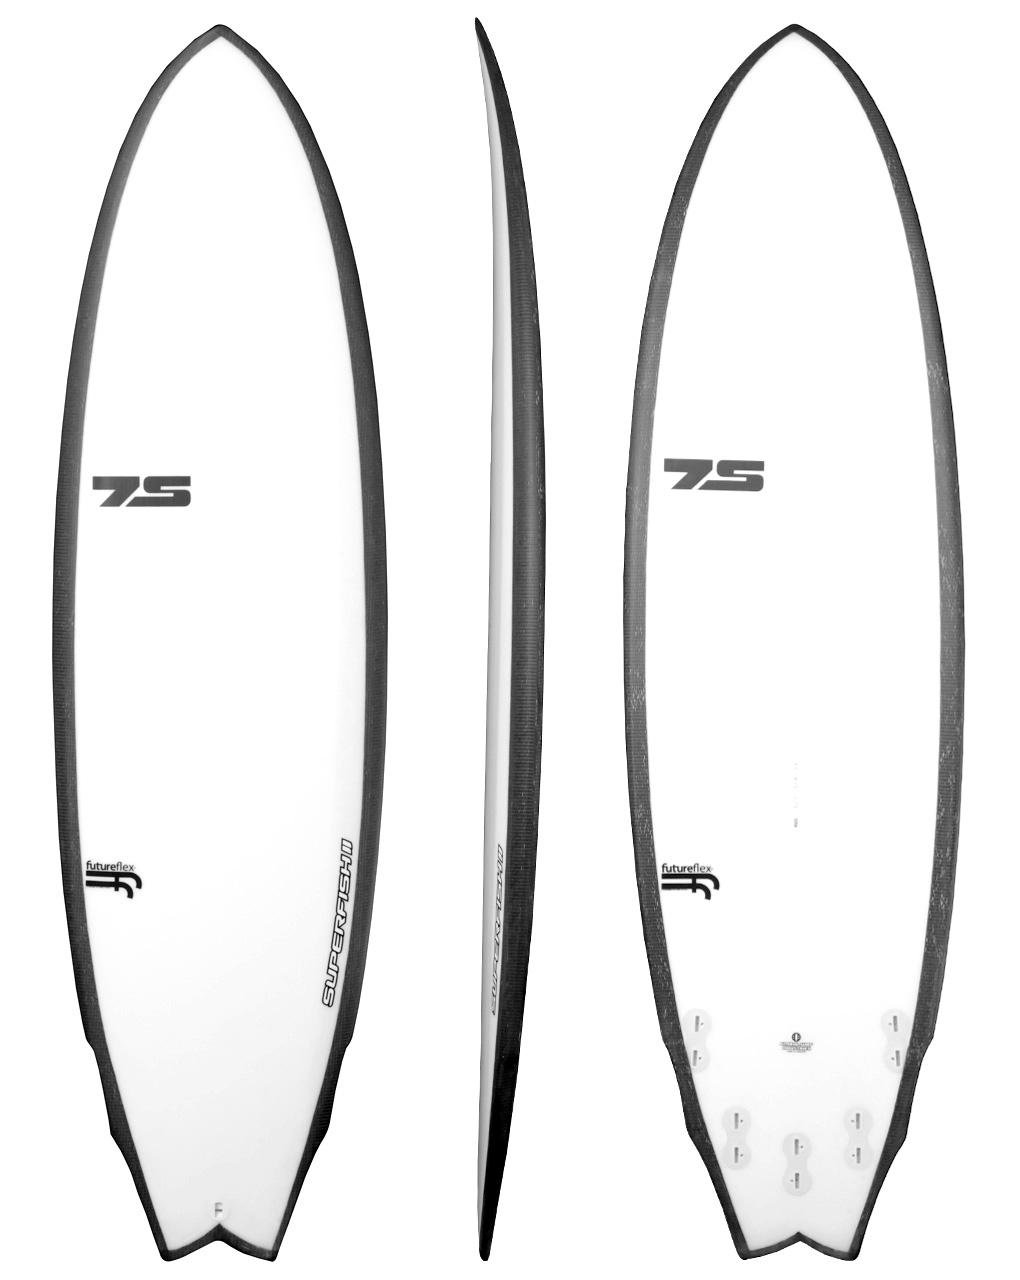 7S SUPER FISH II - PU SURFBOARD | Buy Online Australia! - ClipArt ...